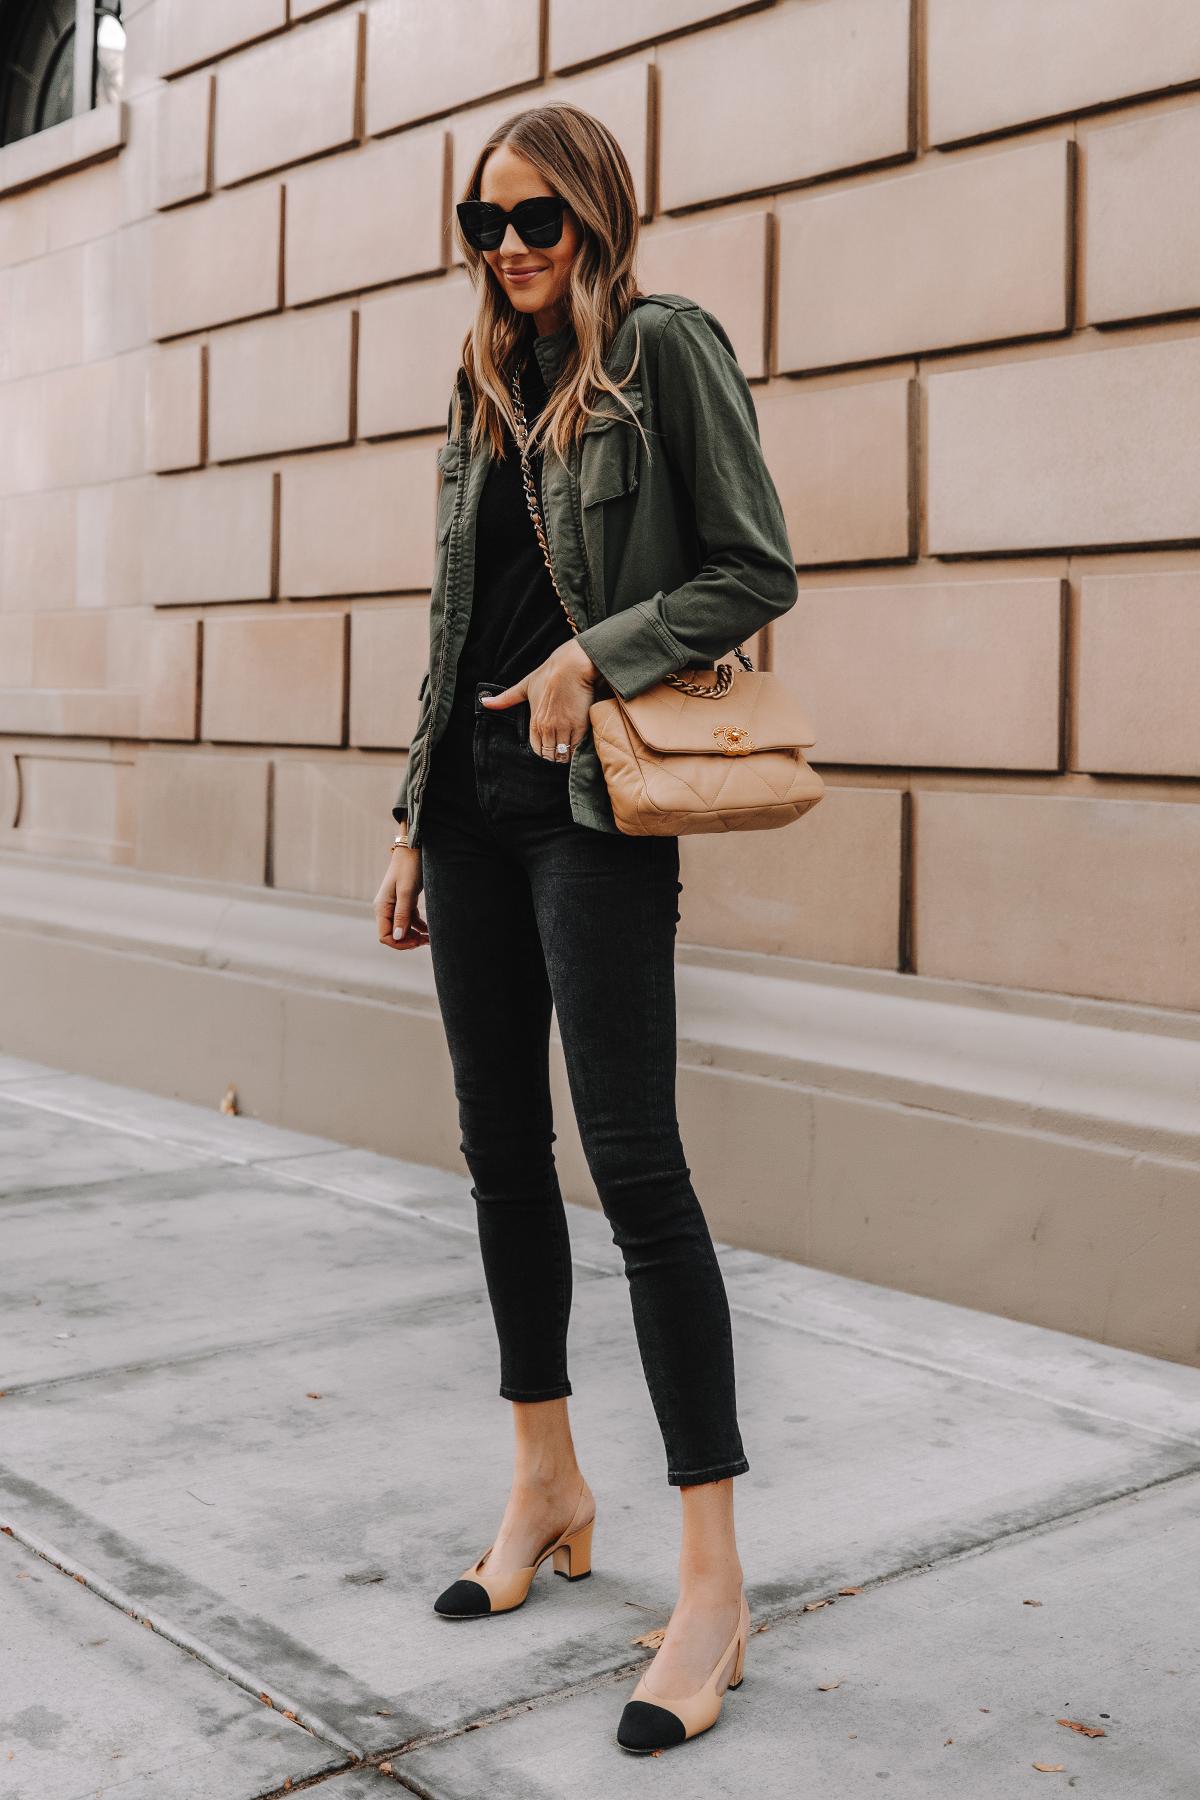 Fashion Jackson Wearing Anine Bing Green Utility Jacket Black Skinny Jeans Chanel Slingbacks Chanel 19 Small Dark Beige Handbag 3